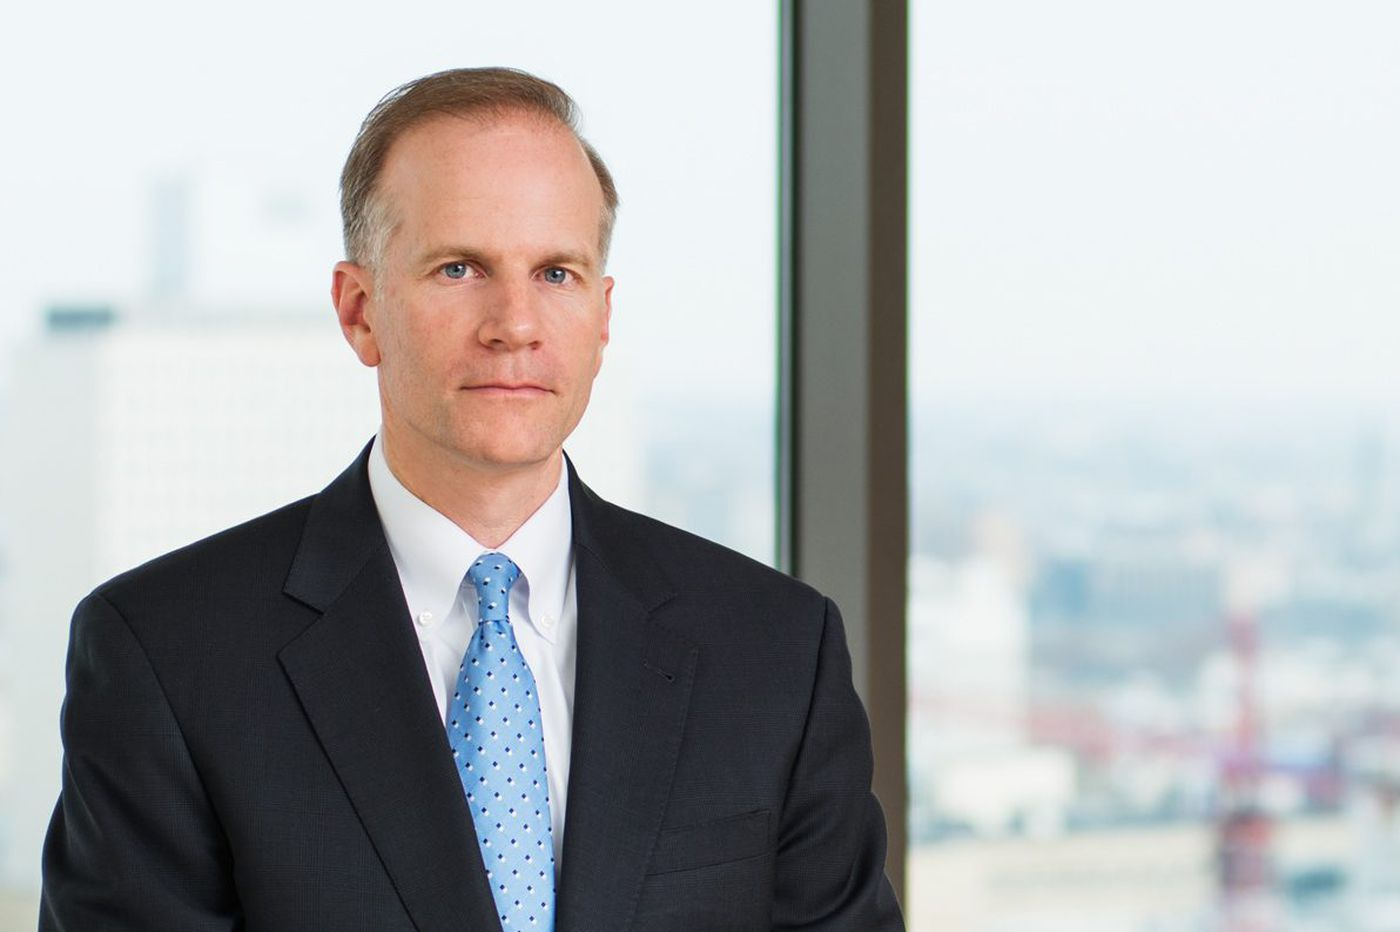 William McSwain confirmed by Senate as U.S. attorney in Philadelphia